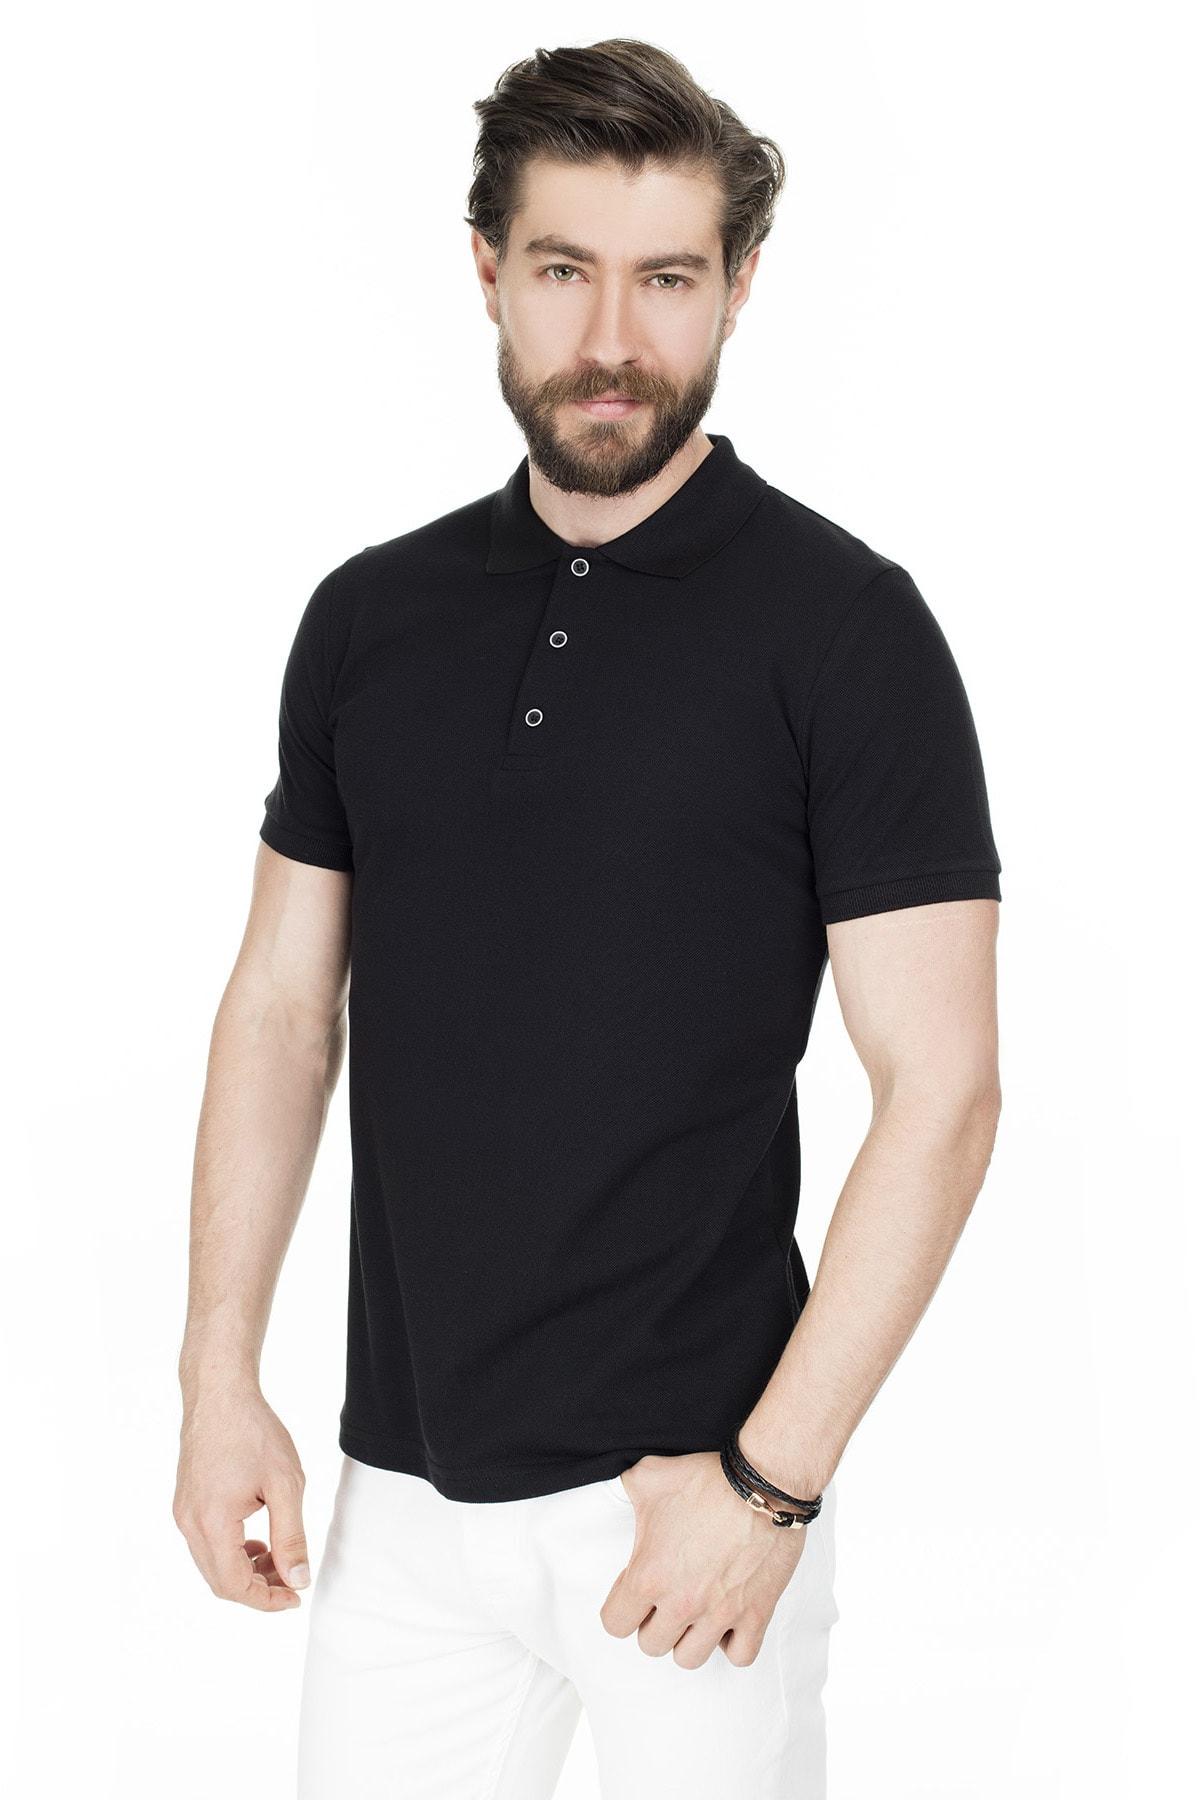 Buratti Erkek Siyah Düğmeli Polo Yaka Pamuklu Günlük T Shirt 4362050 2